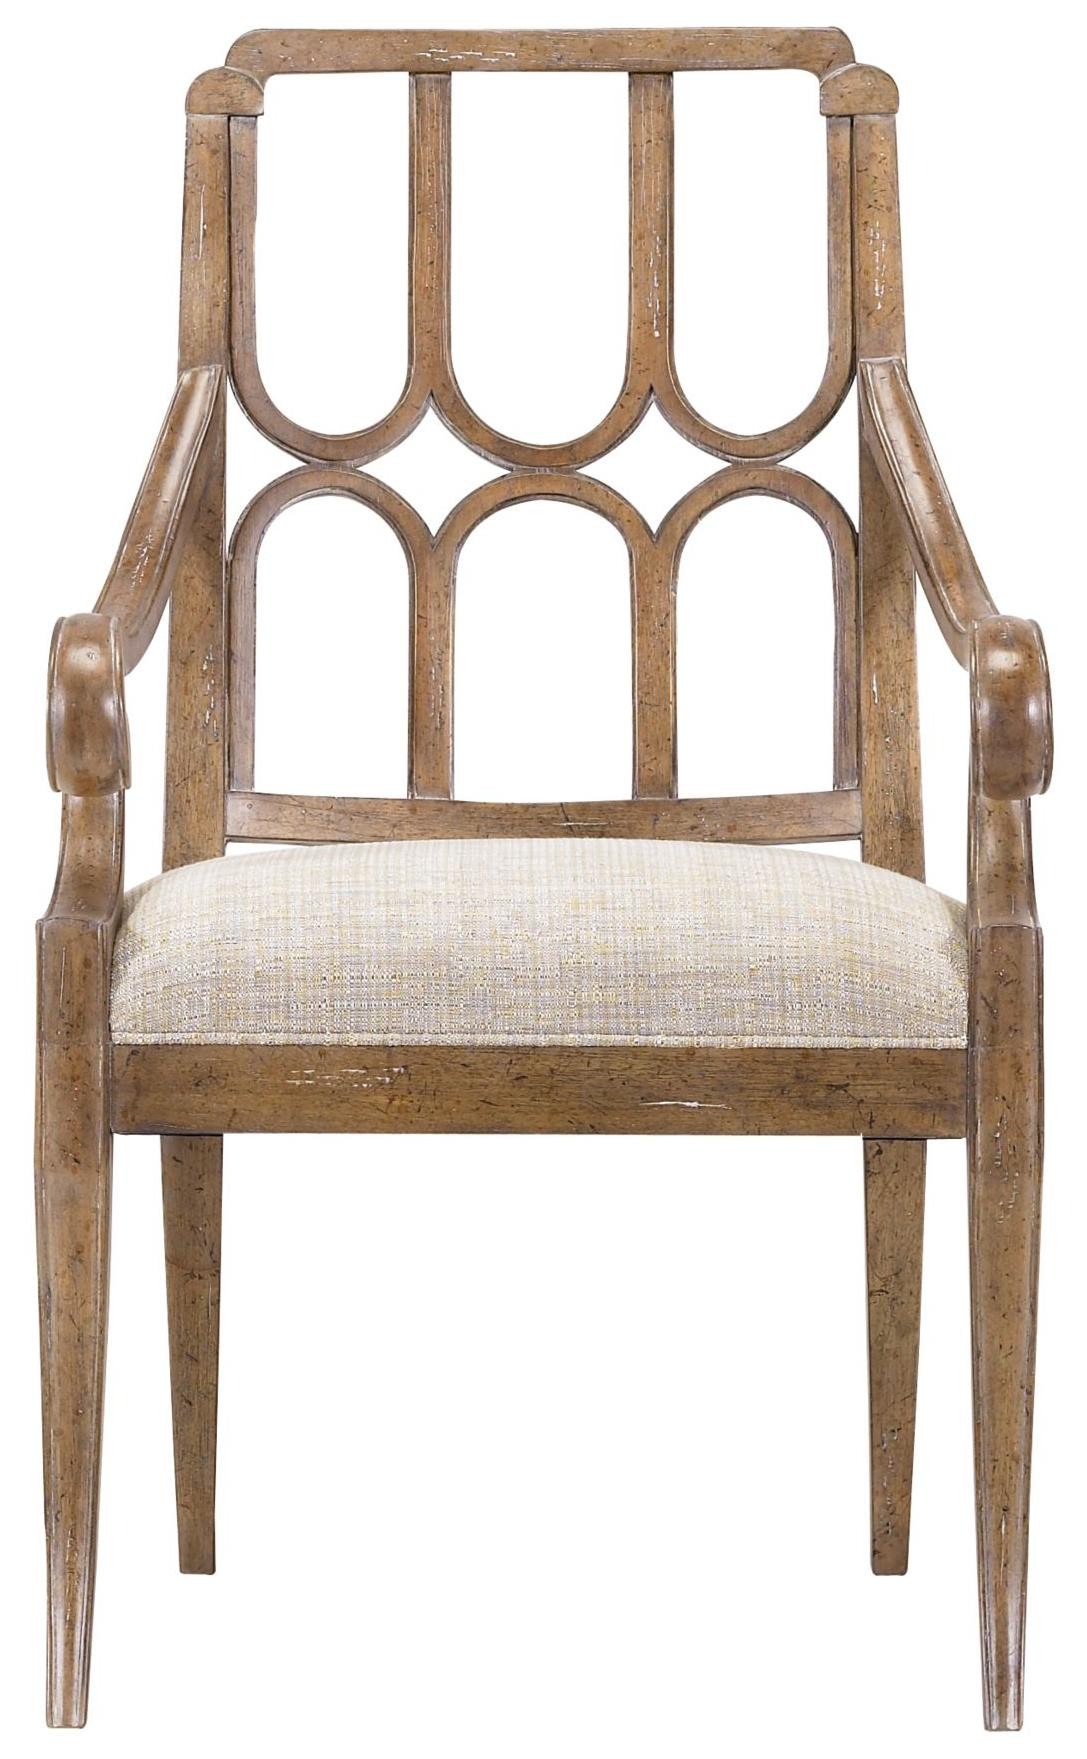 Stanley Furniture Archipelago Port Royal Arm Chair - Item Number: 186-61-70